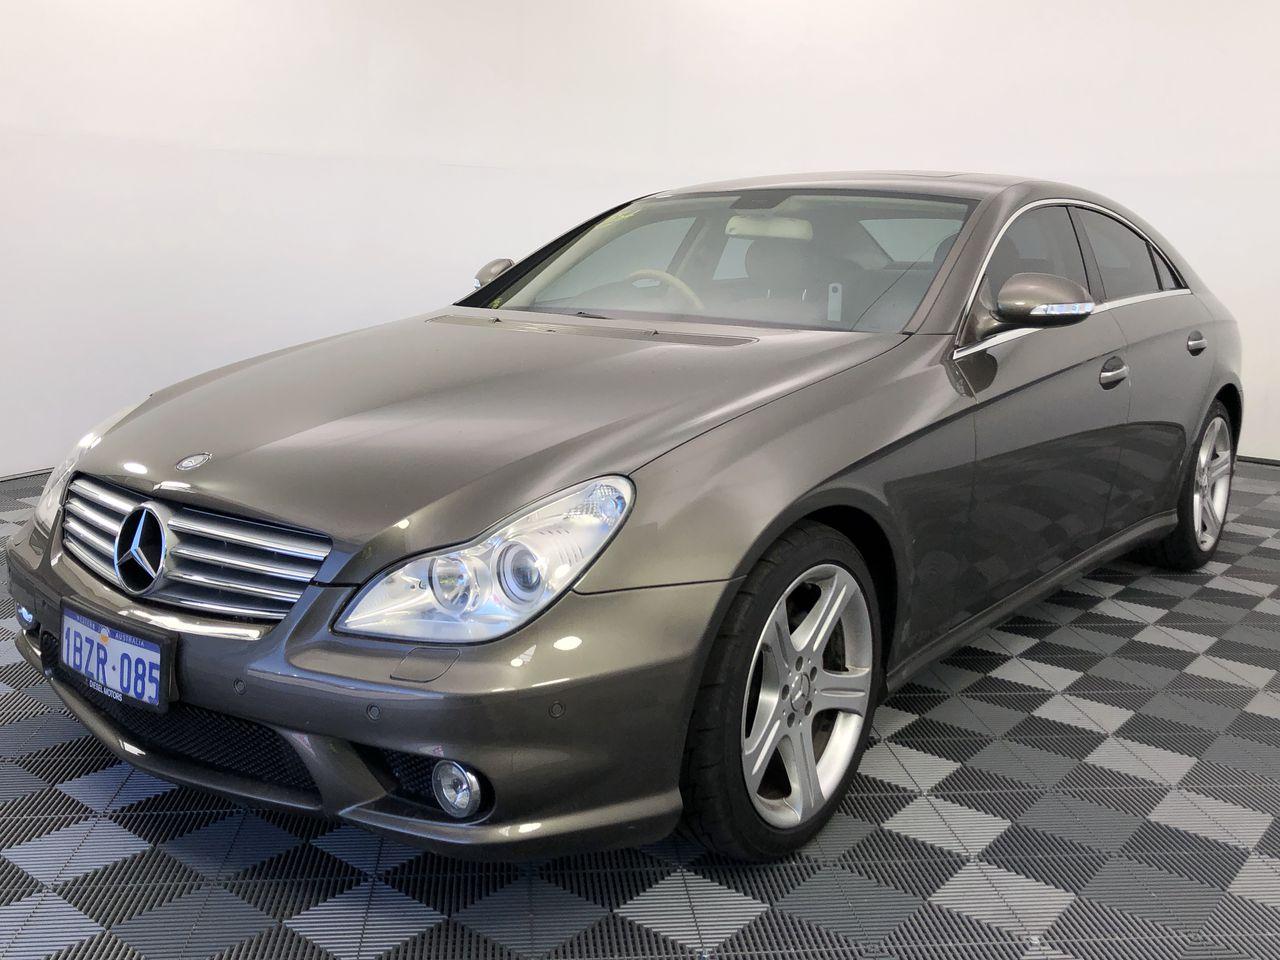 2005 Mercedes Benz CLS-Class CLS 350 C219 Automatic Coupe